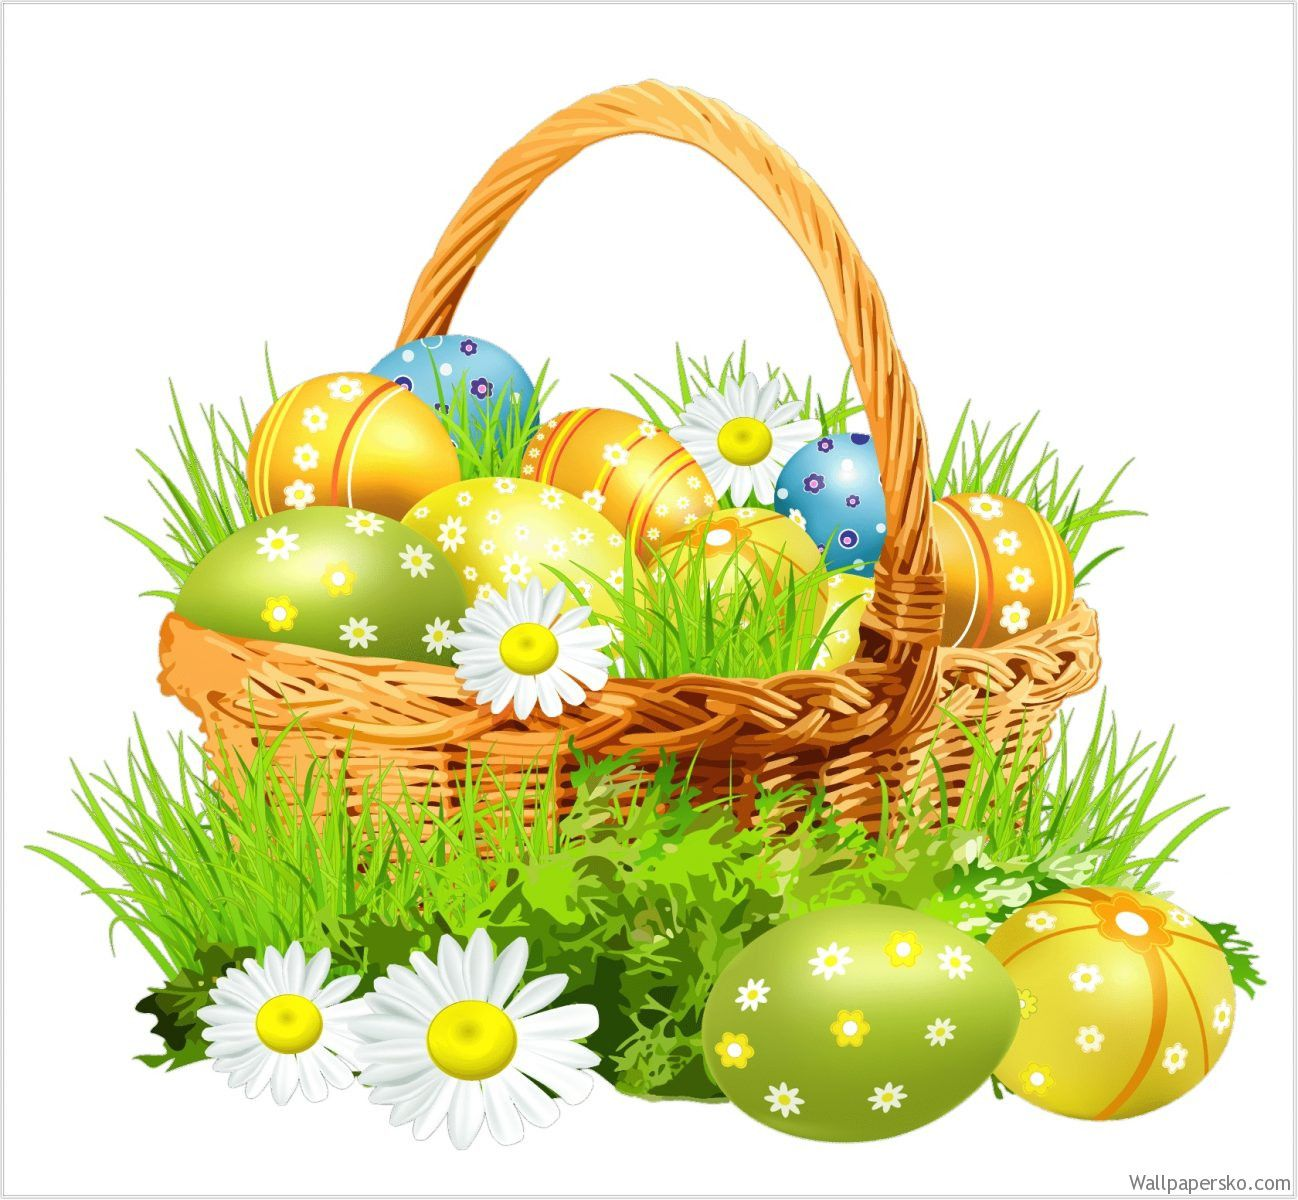 Easter Images Png Https Wallpapersko Com Easter Images Png Html Hd Wallpapers Download Easter Images Easter Easter Pictures